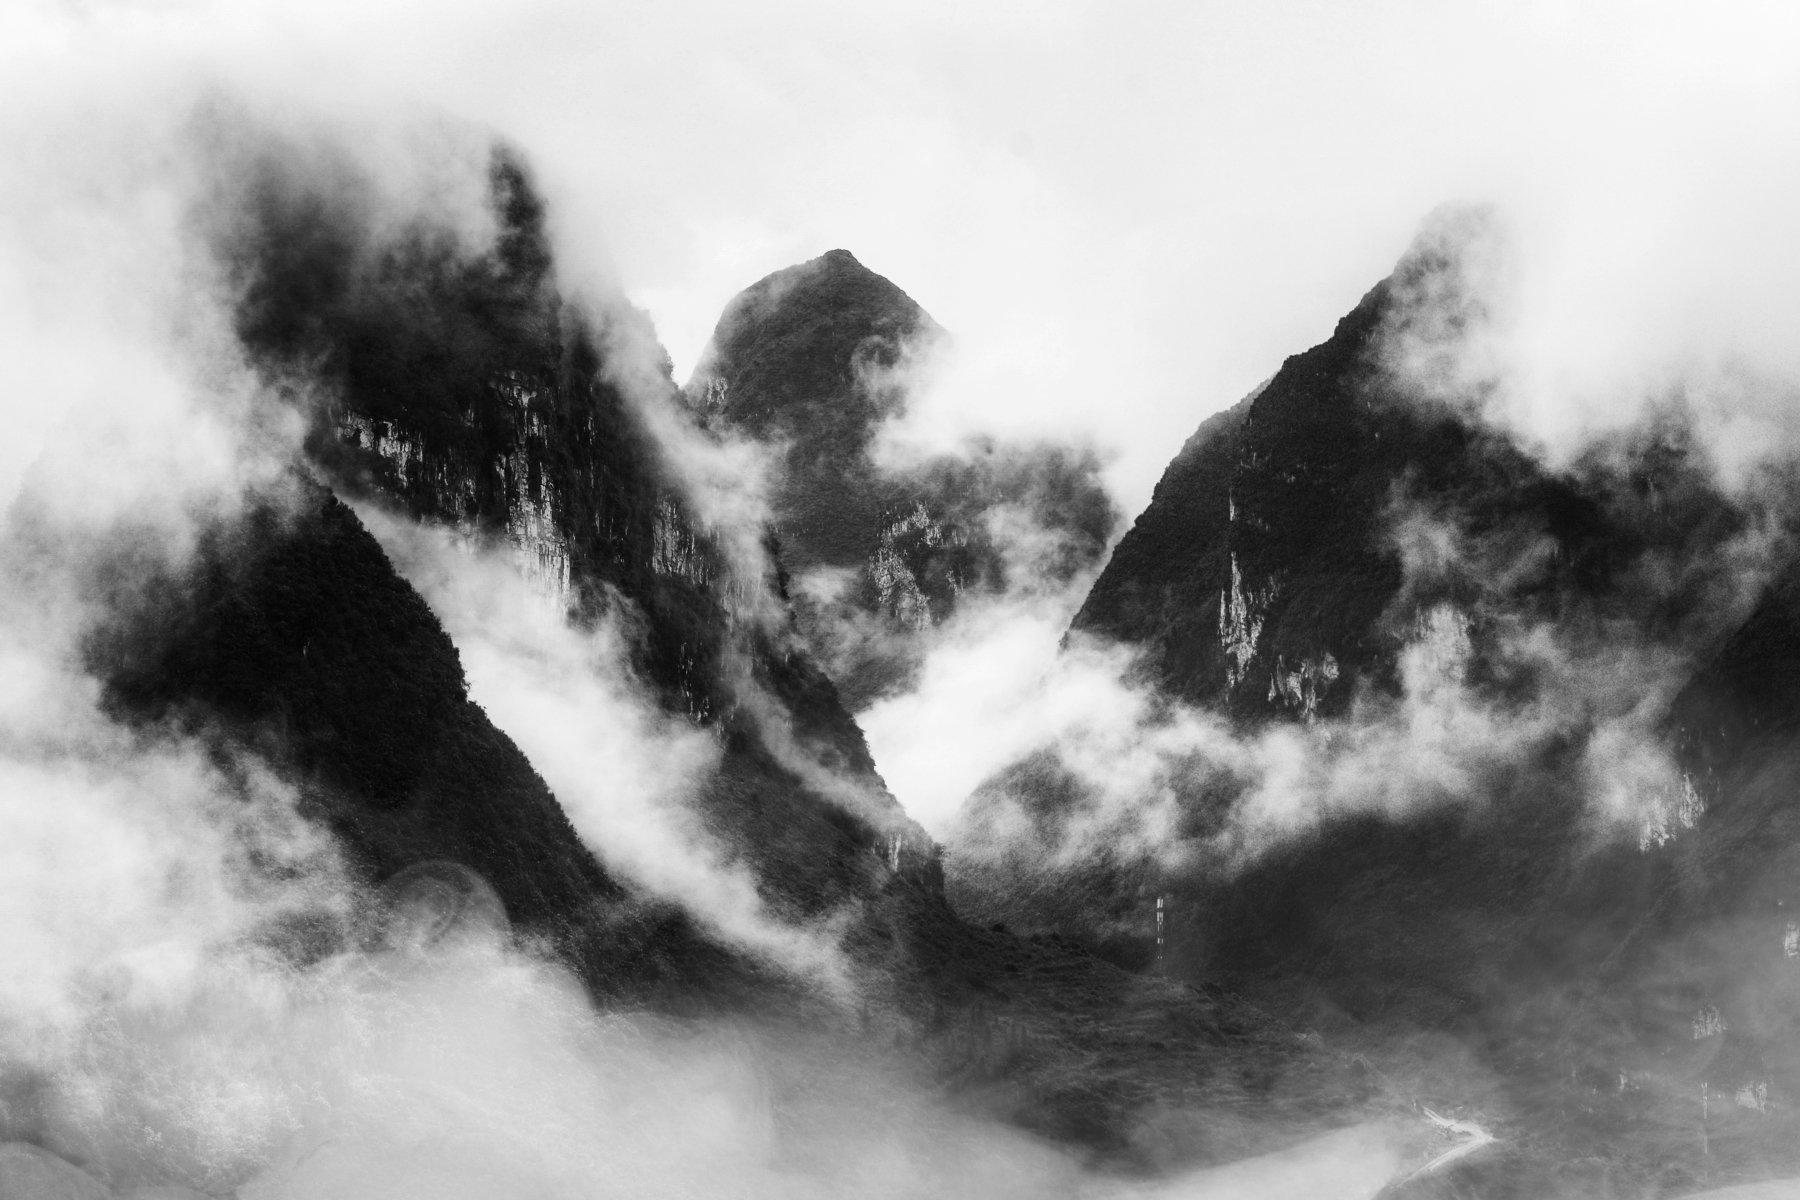 ngo cuong, dong van, ha giang, vietnam, black and white, landscape, moutain, cloud, smoke, indochina, Ngo Cuong